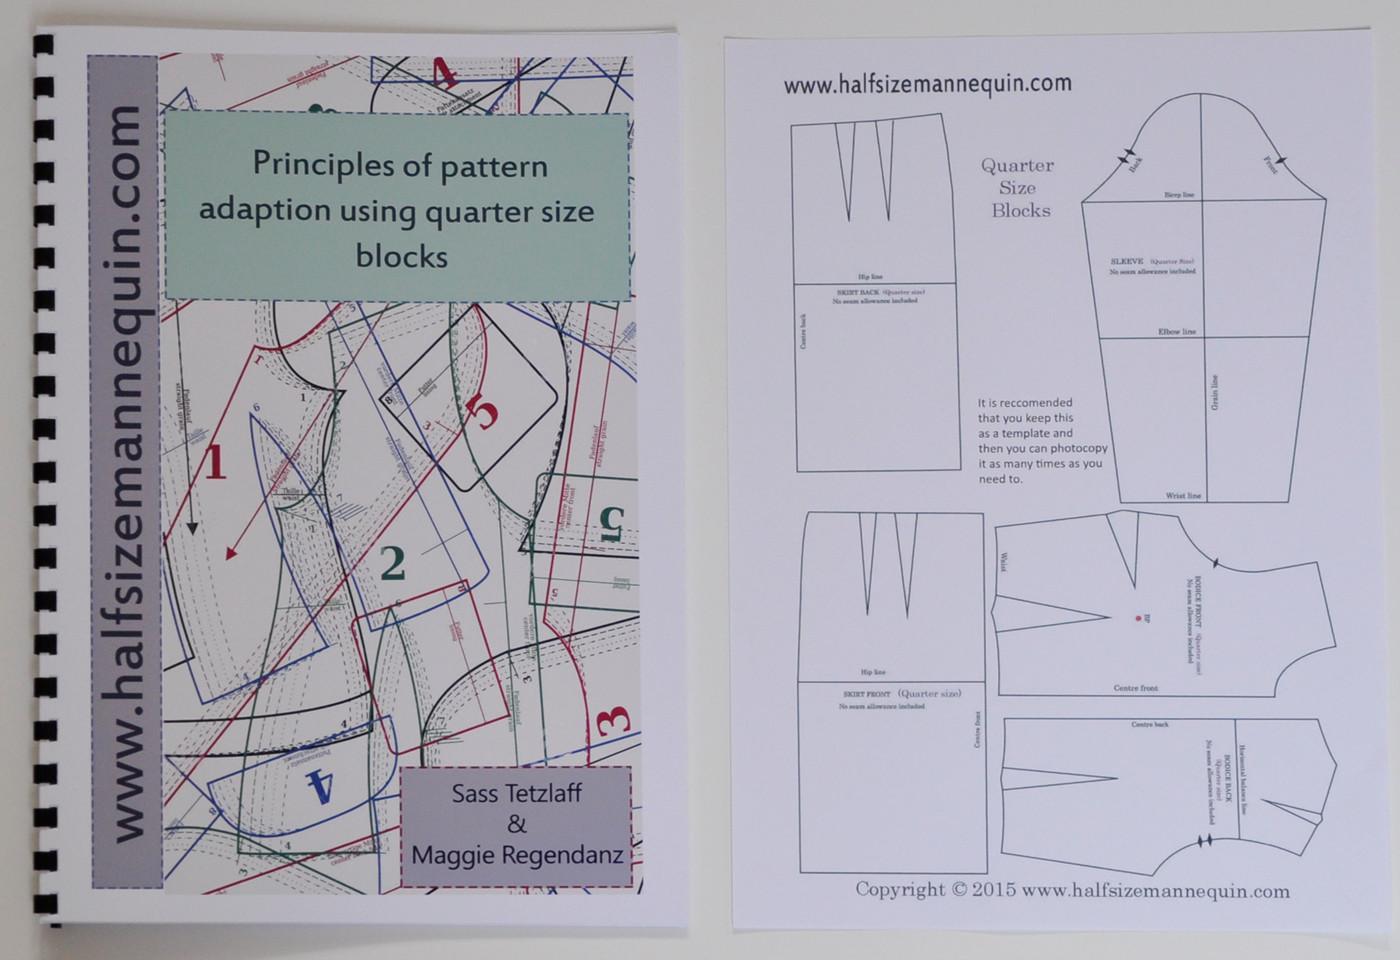 Principles of pattern adaptation using quarter size blocks booklet  (Including quarter size block templates)